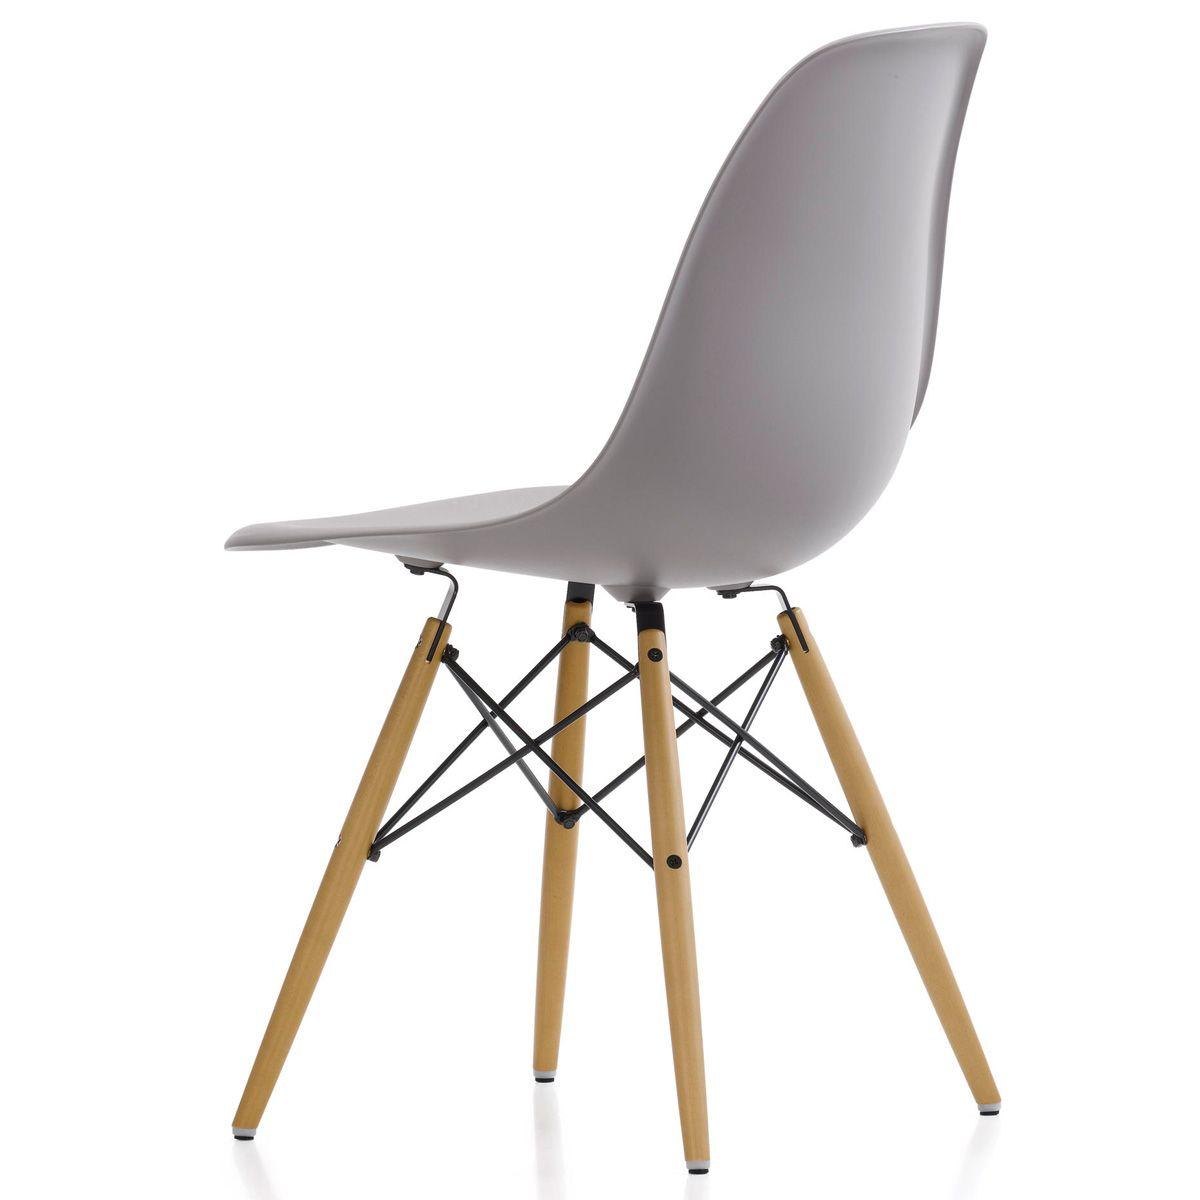 Silla Eames Plastic DSW Vitra original  Tienda online Naharro mobiliario